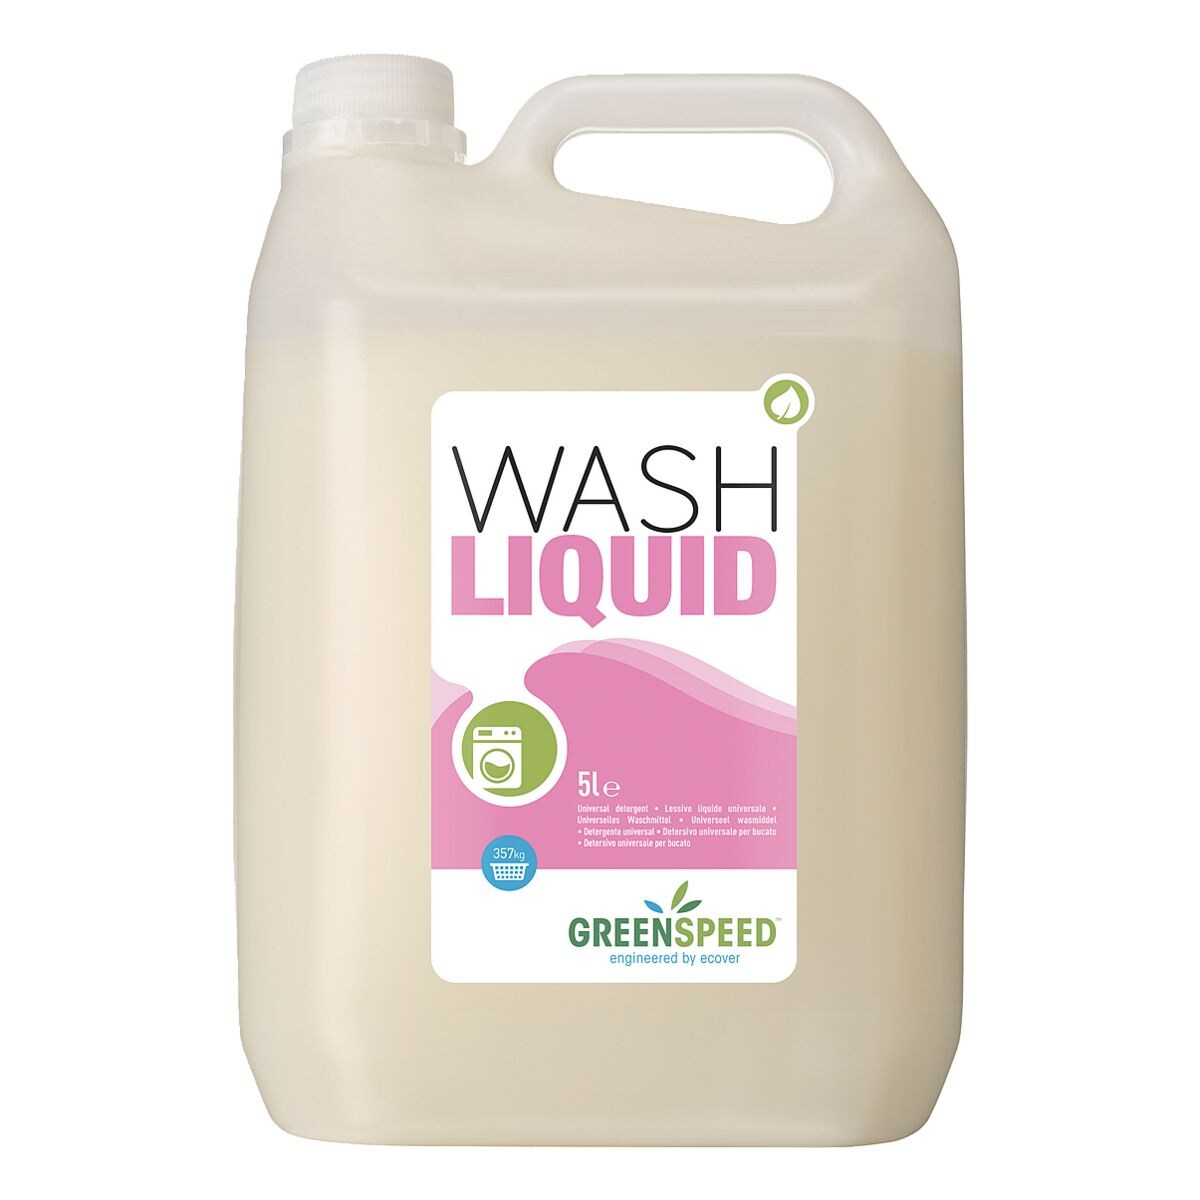 GREENSPEED Lessive liquide « Wash Liquid » 100 l.